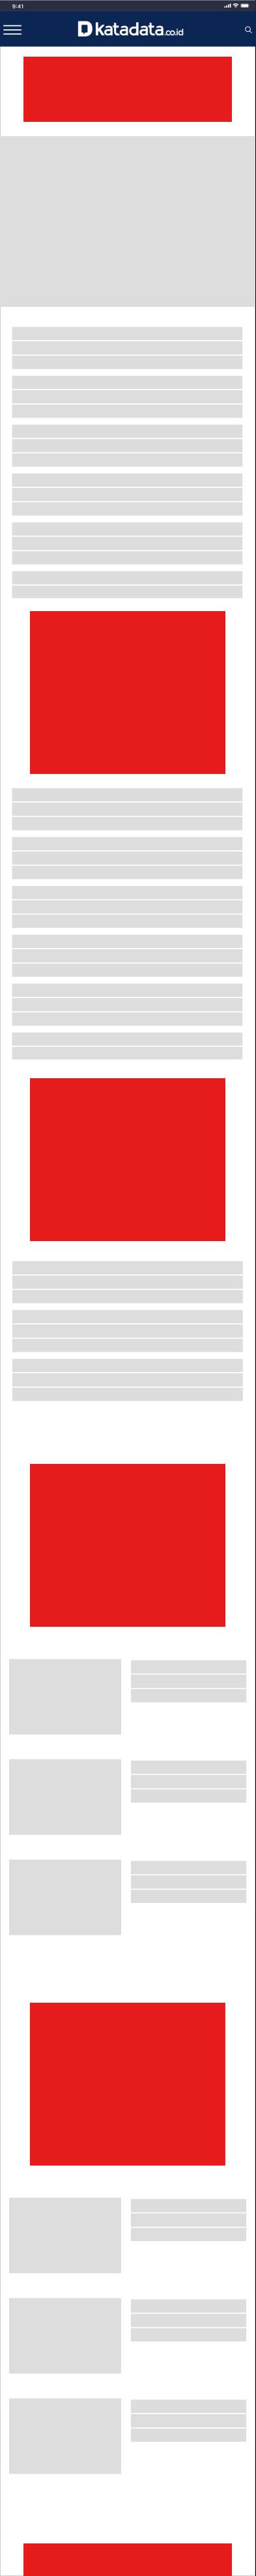 Mobile Detailpage